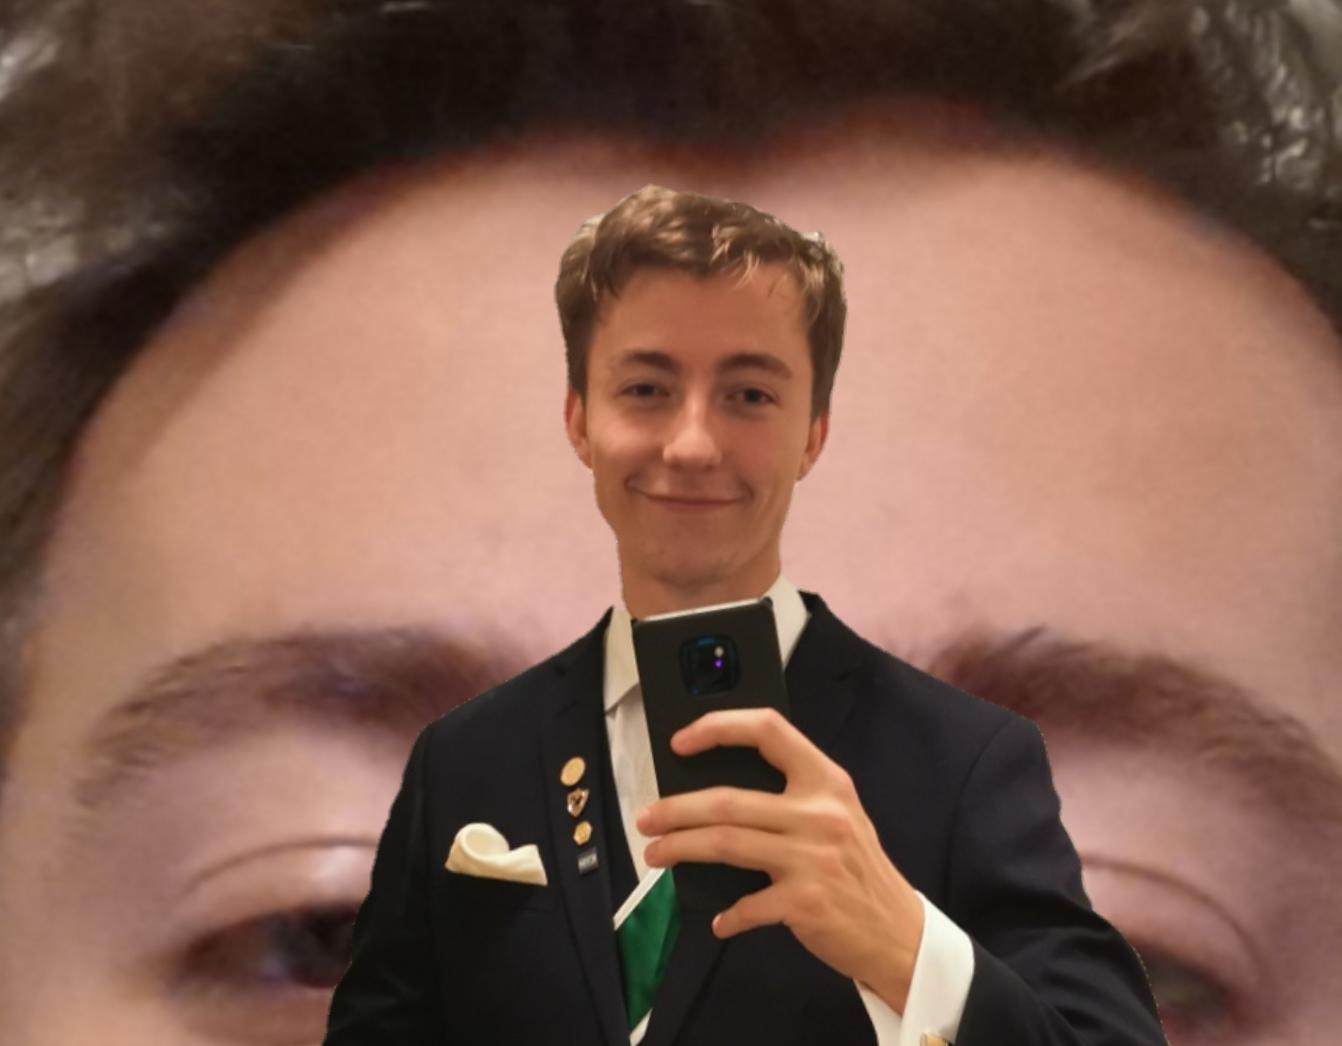 Marius Enger Høgåsen